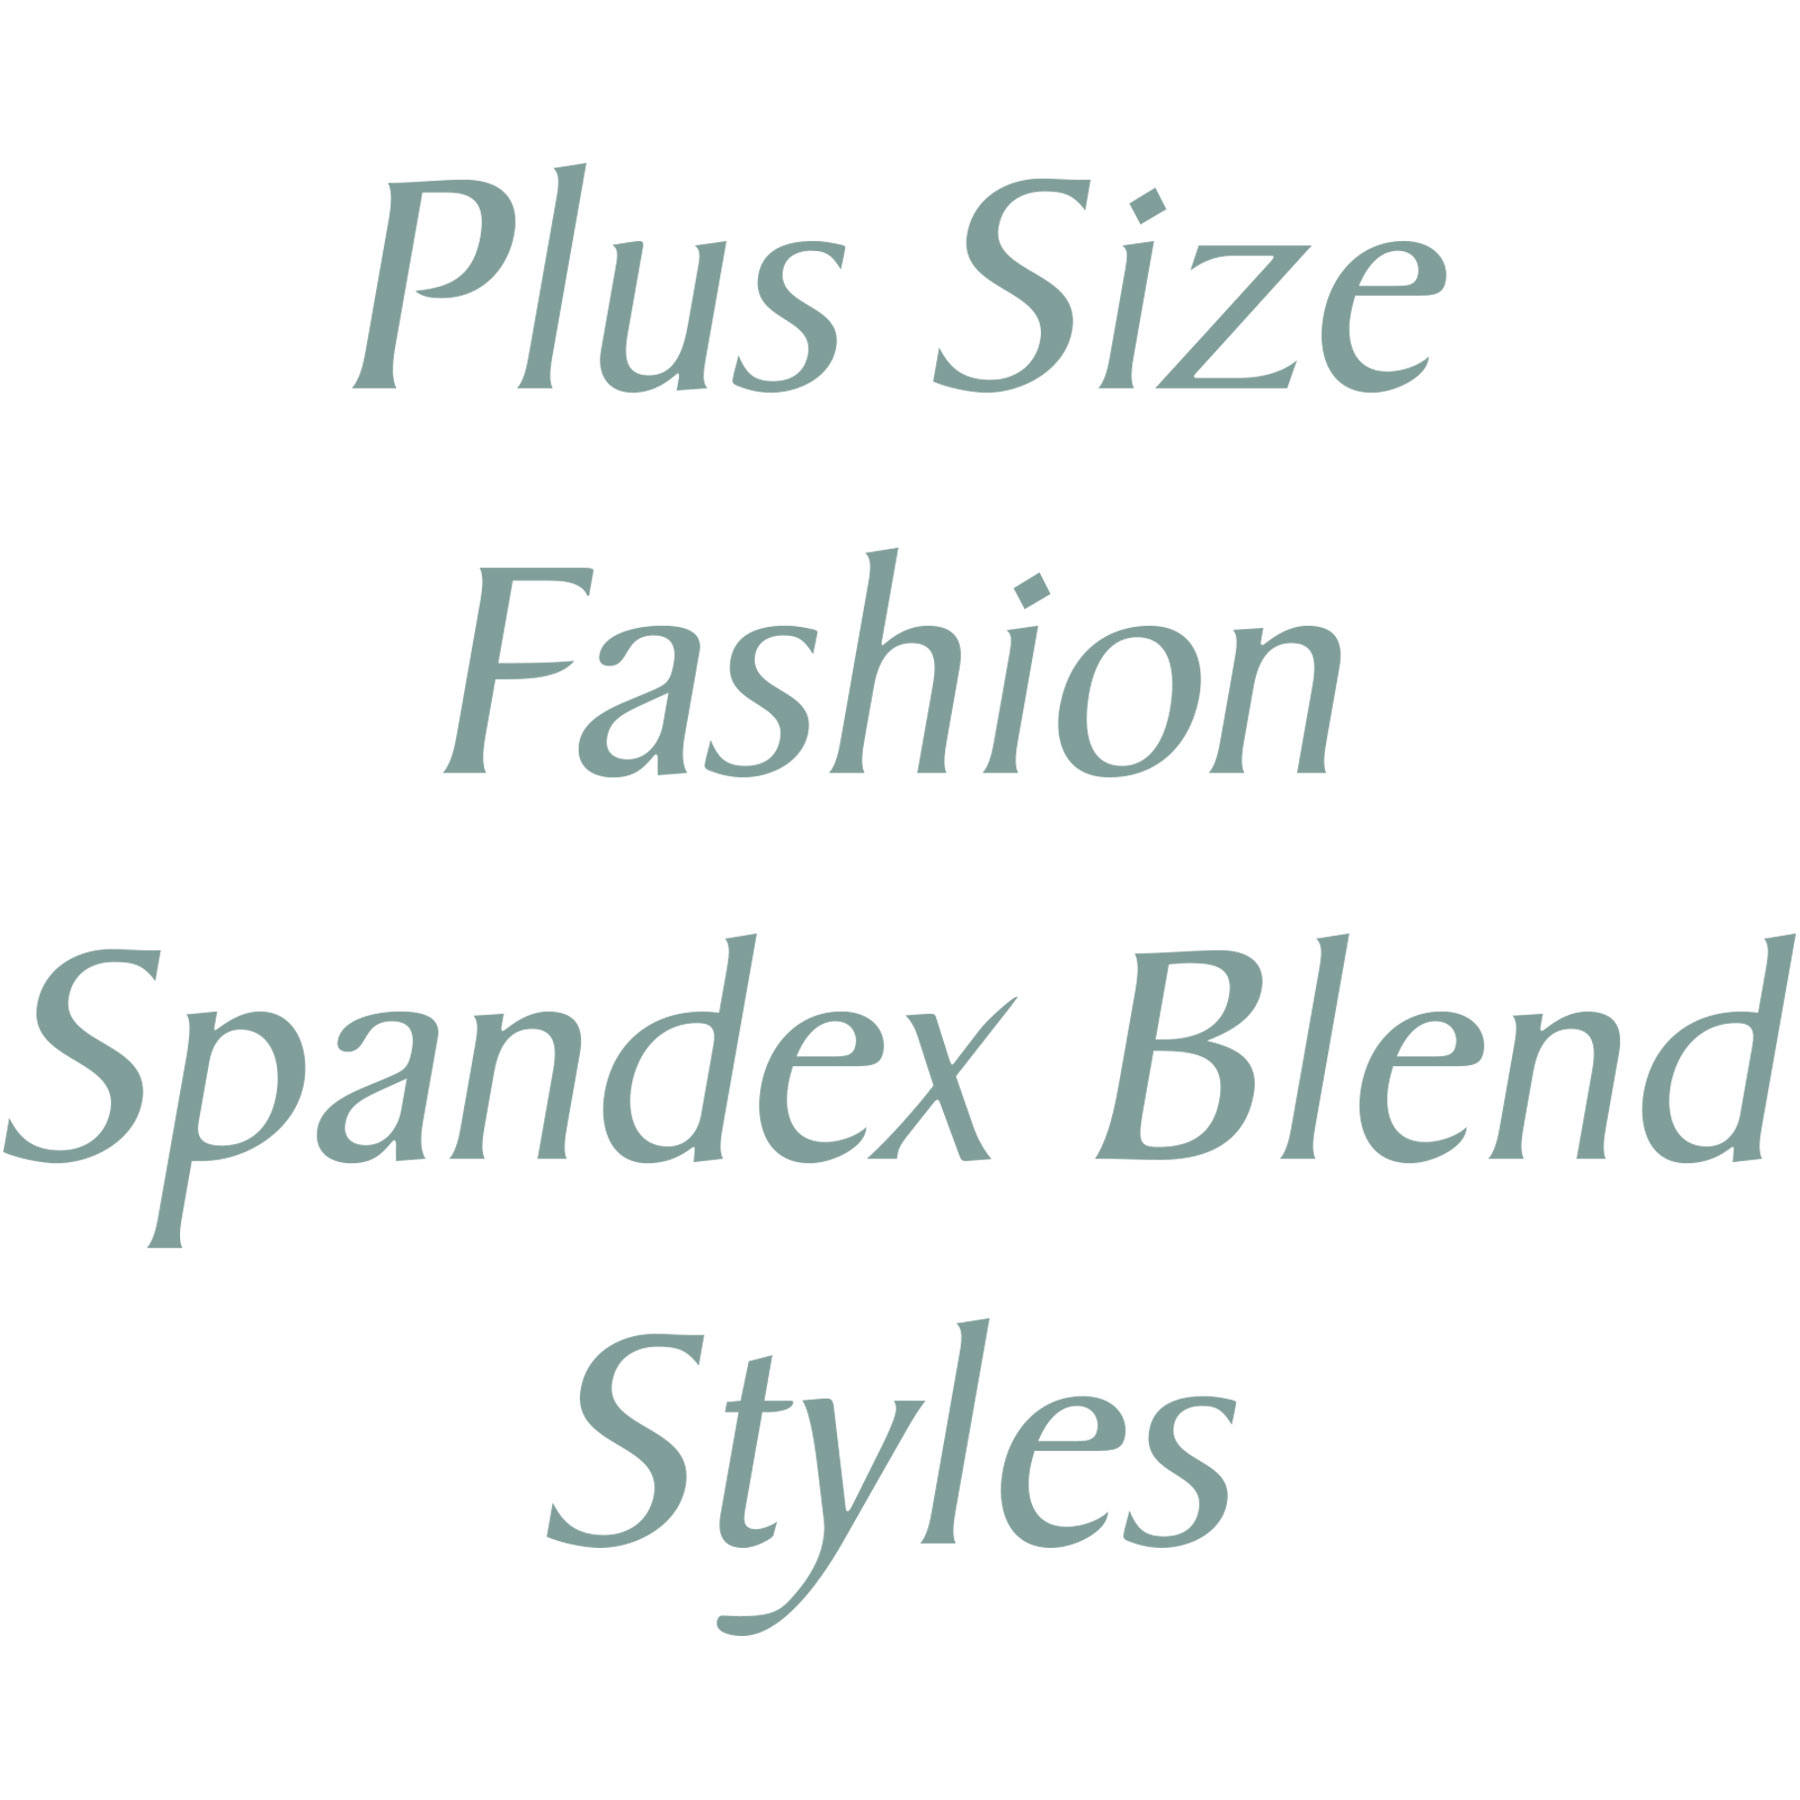 Spandex Blend Styles